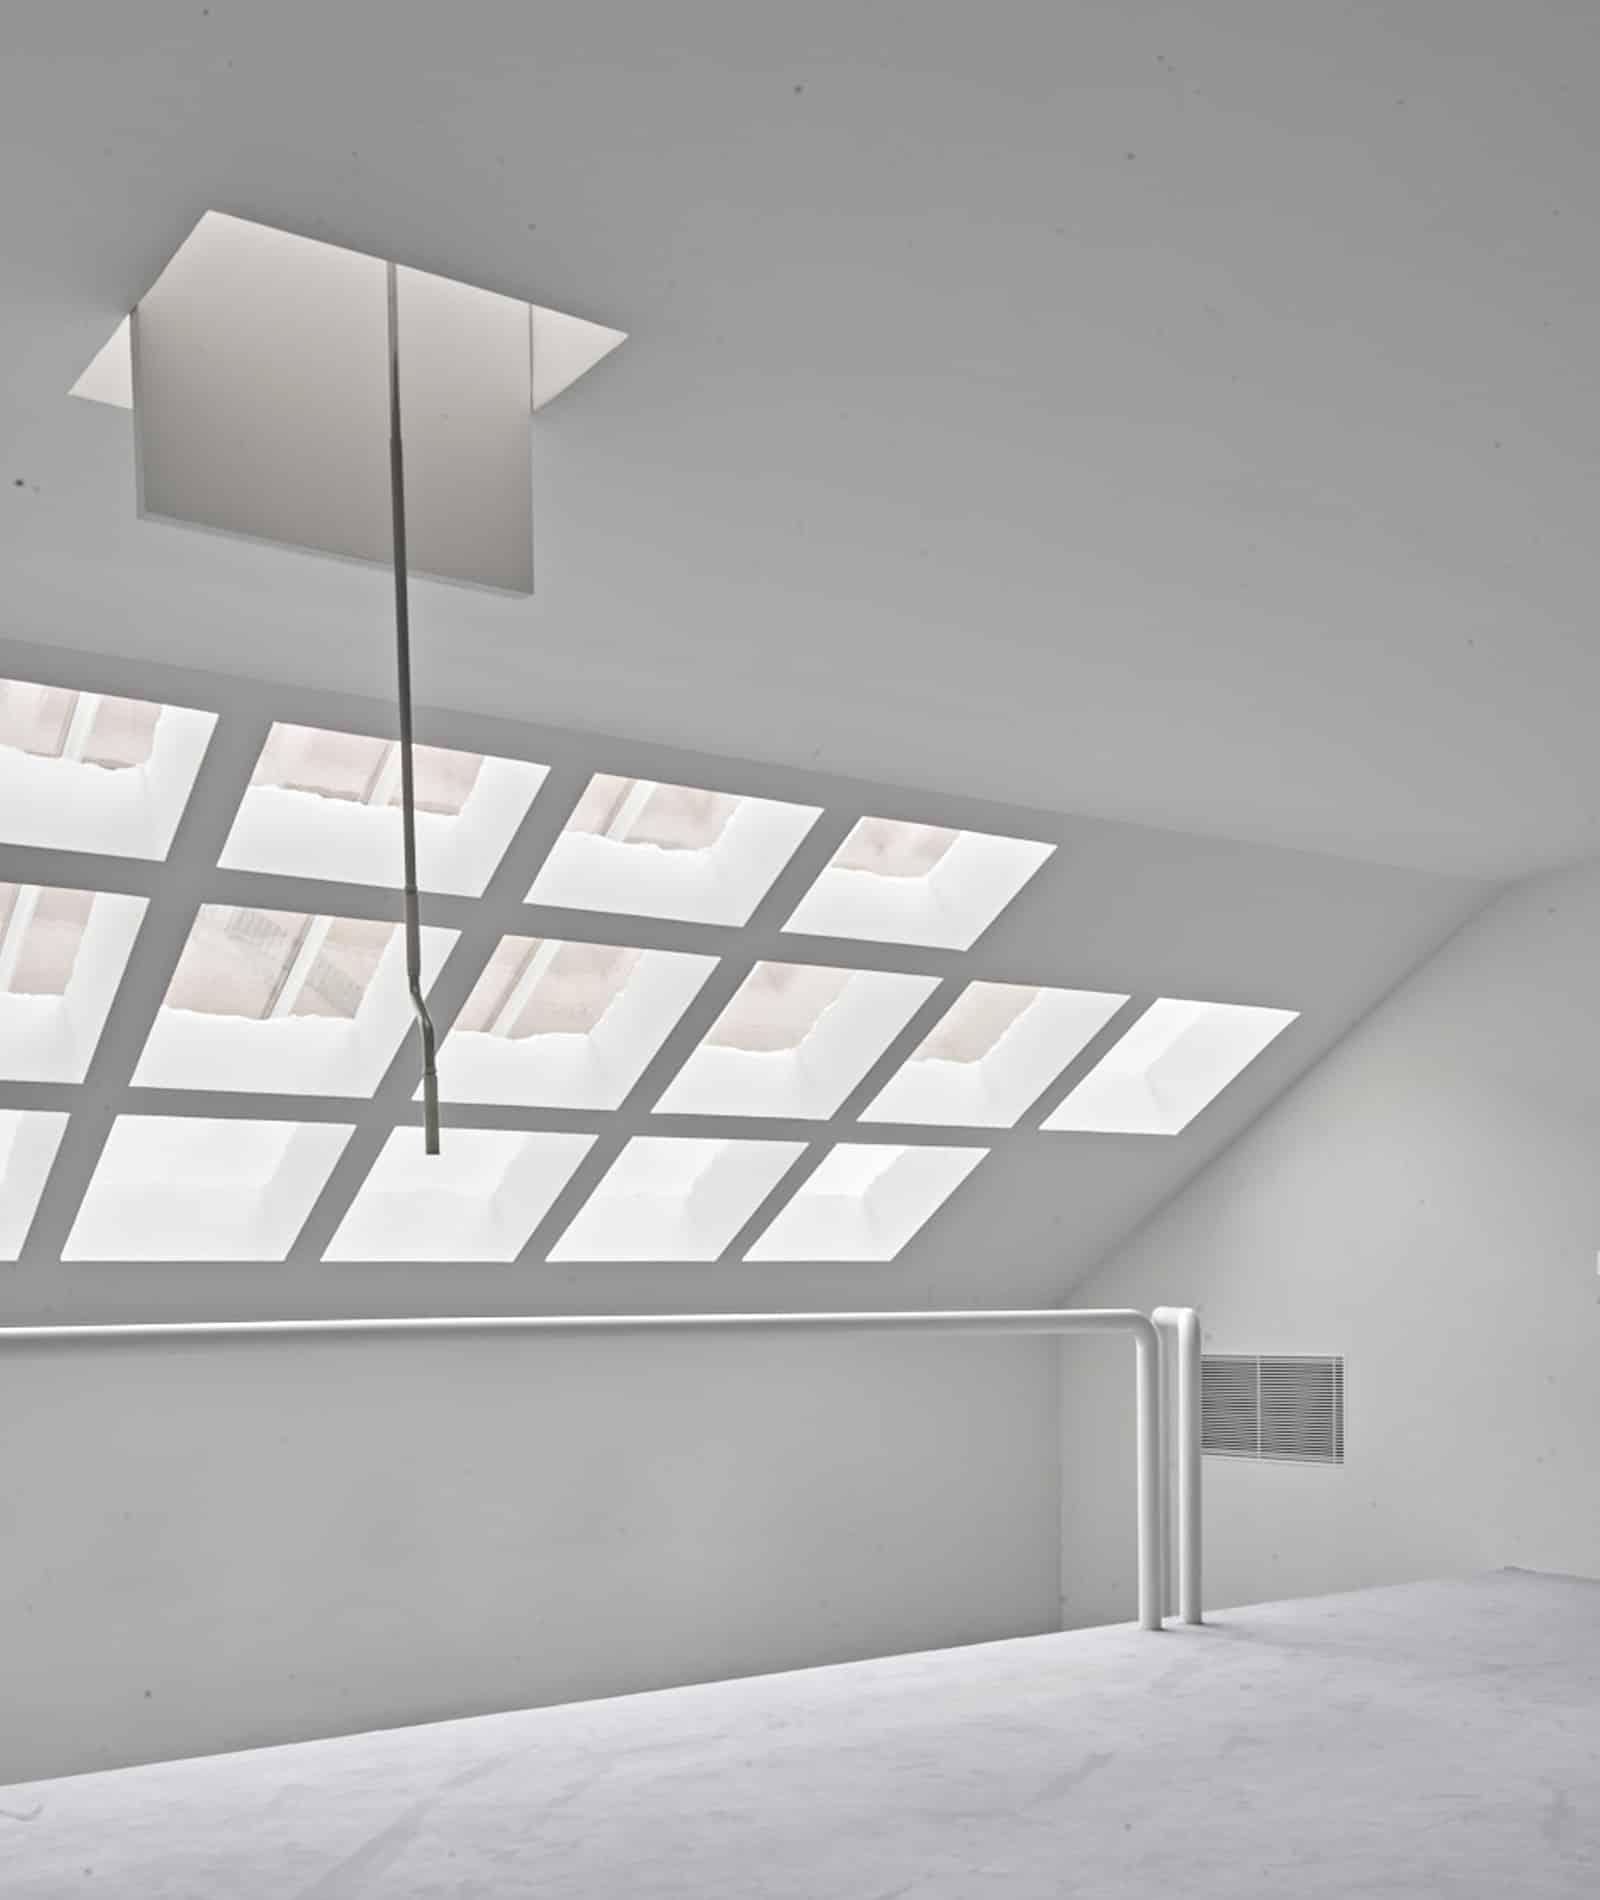 Casa Omar  - 03 ArquitecturaG CasaOmar 1 39